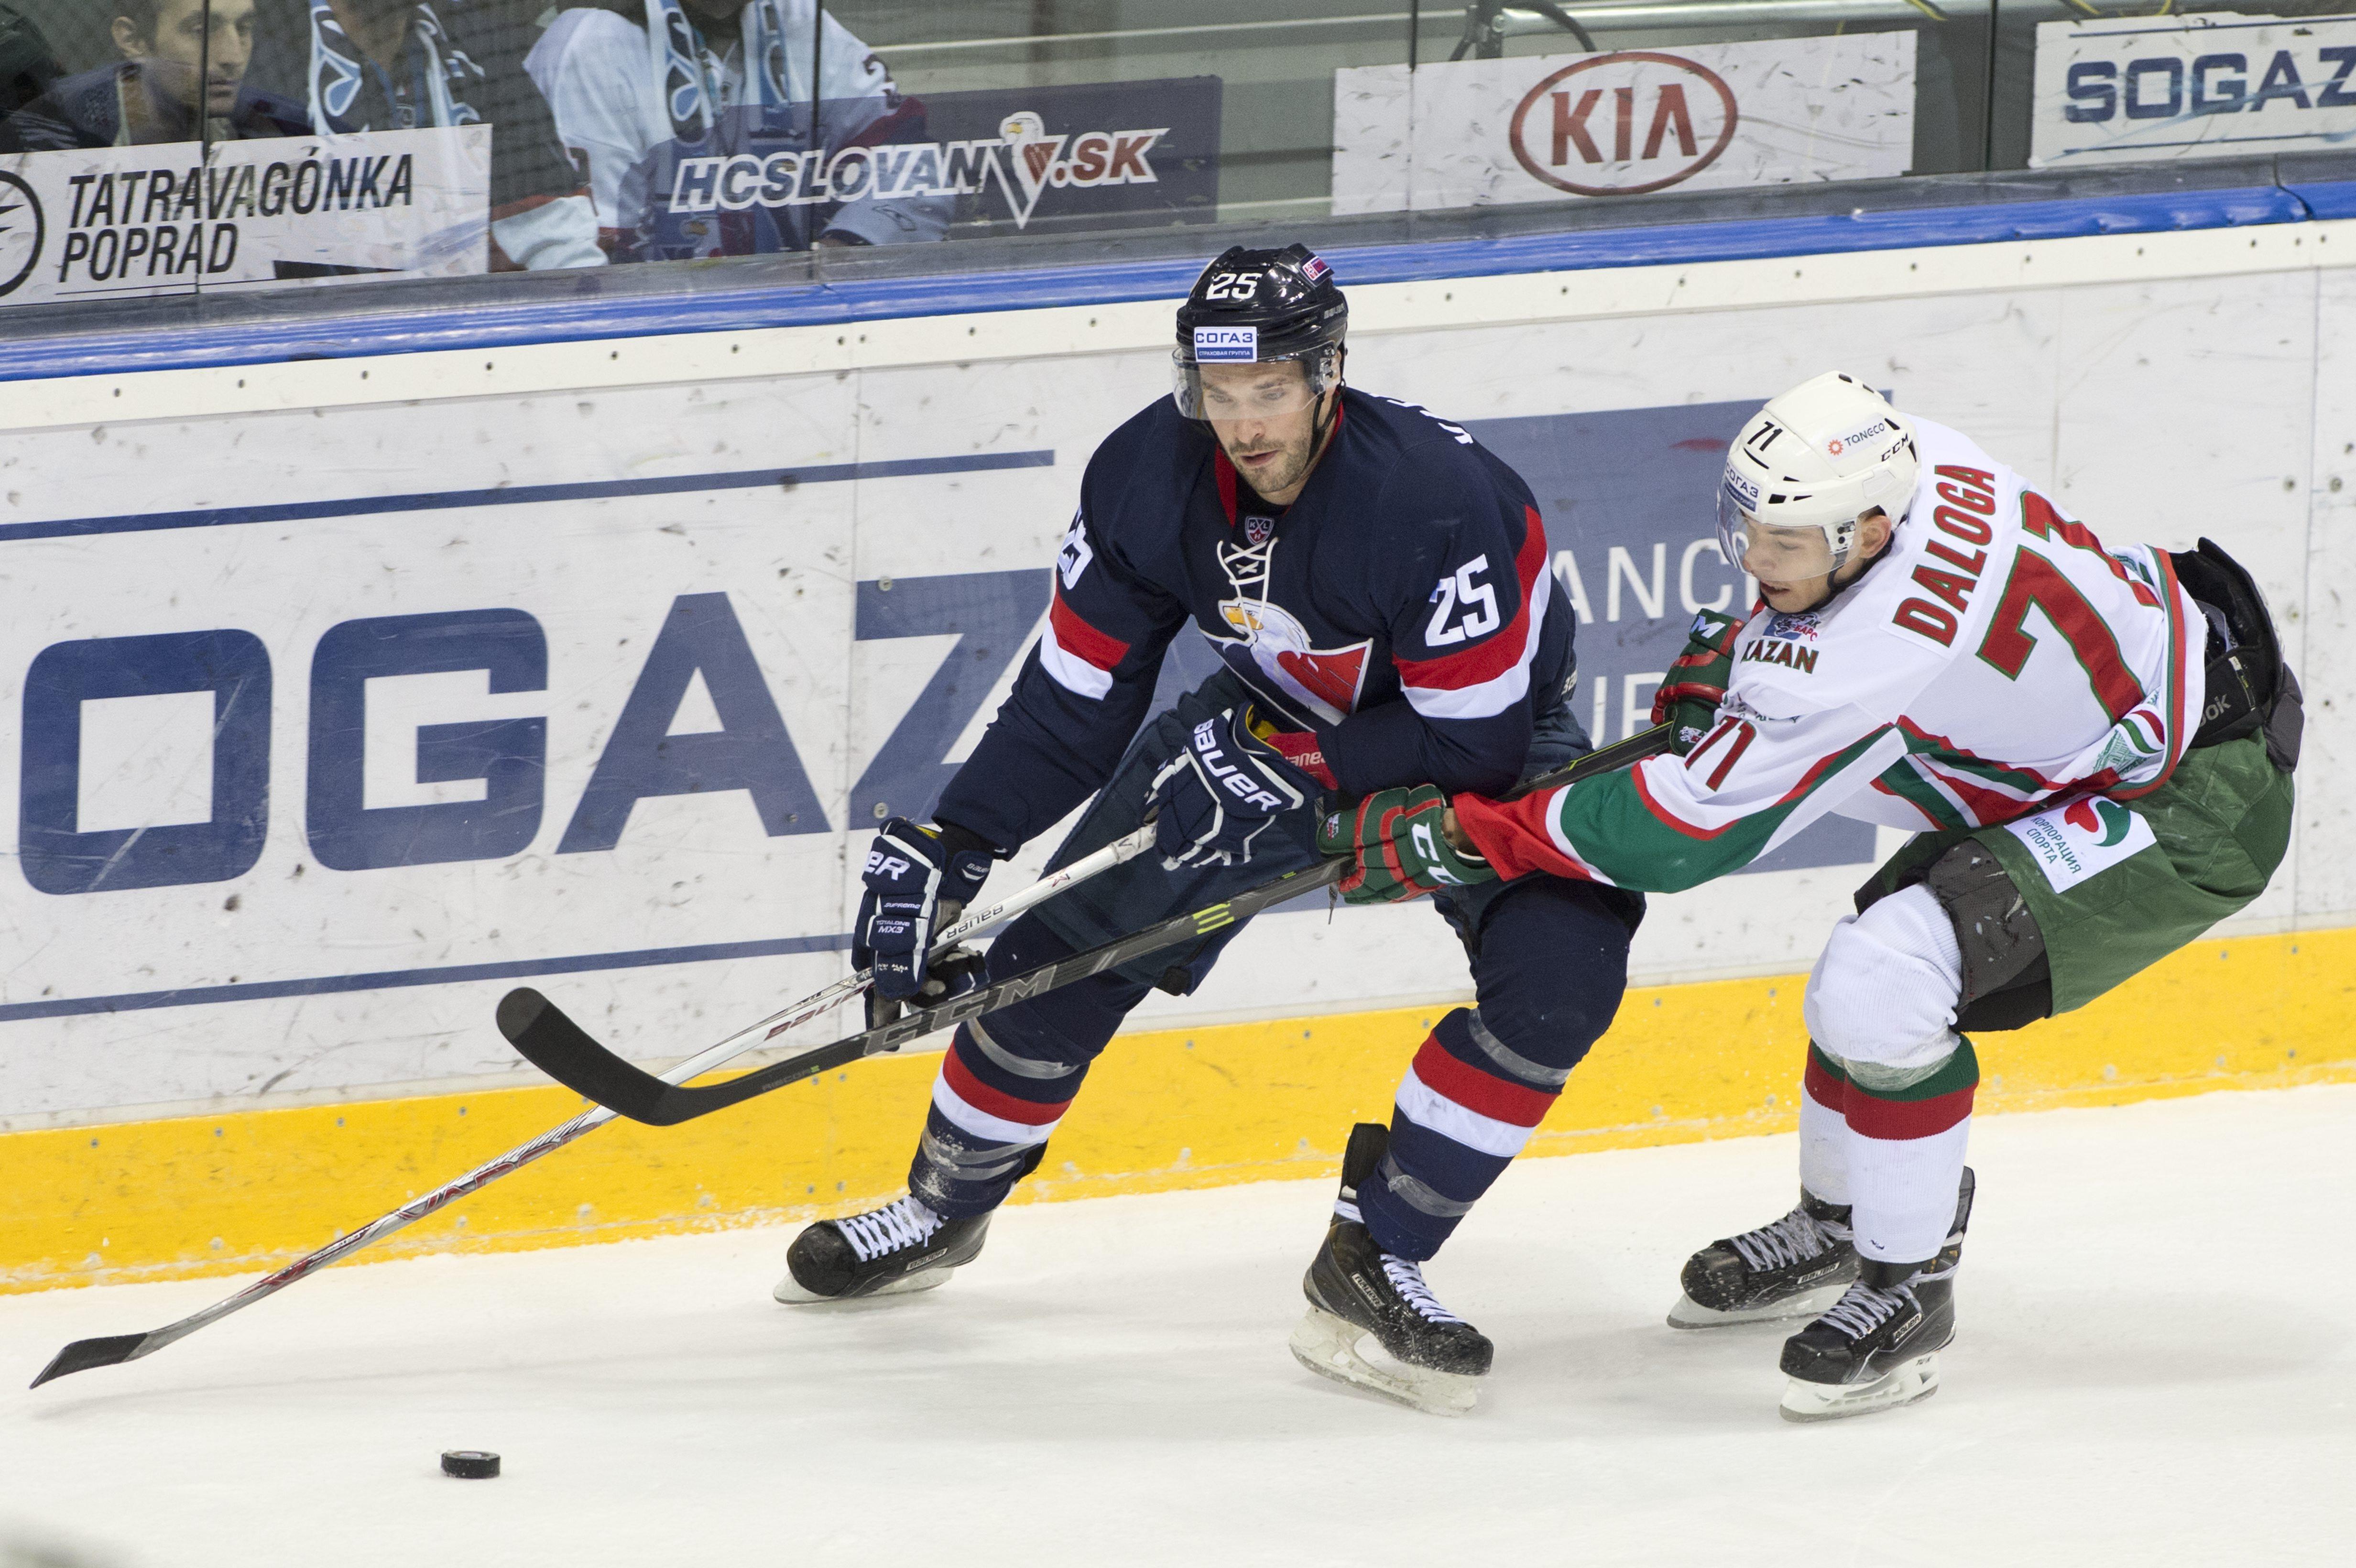 20151030_hokej3297836.jpg